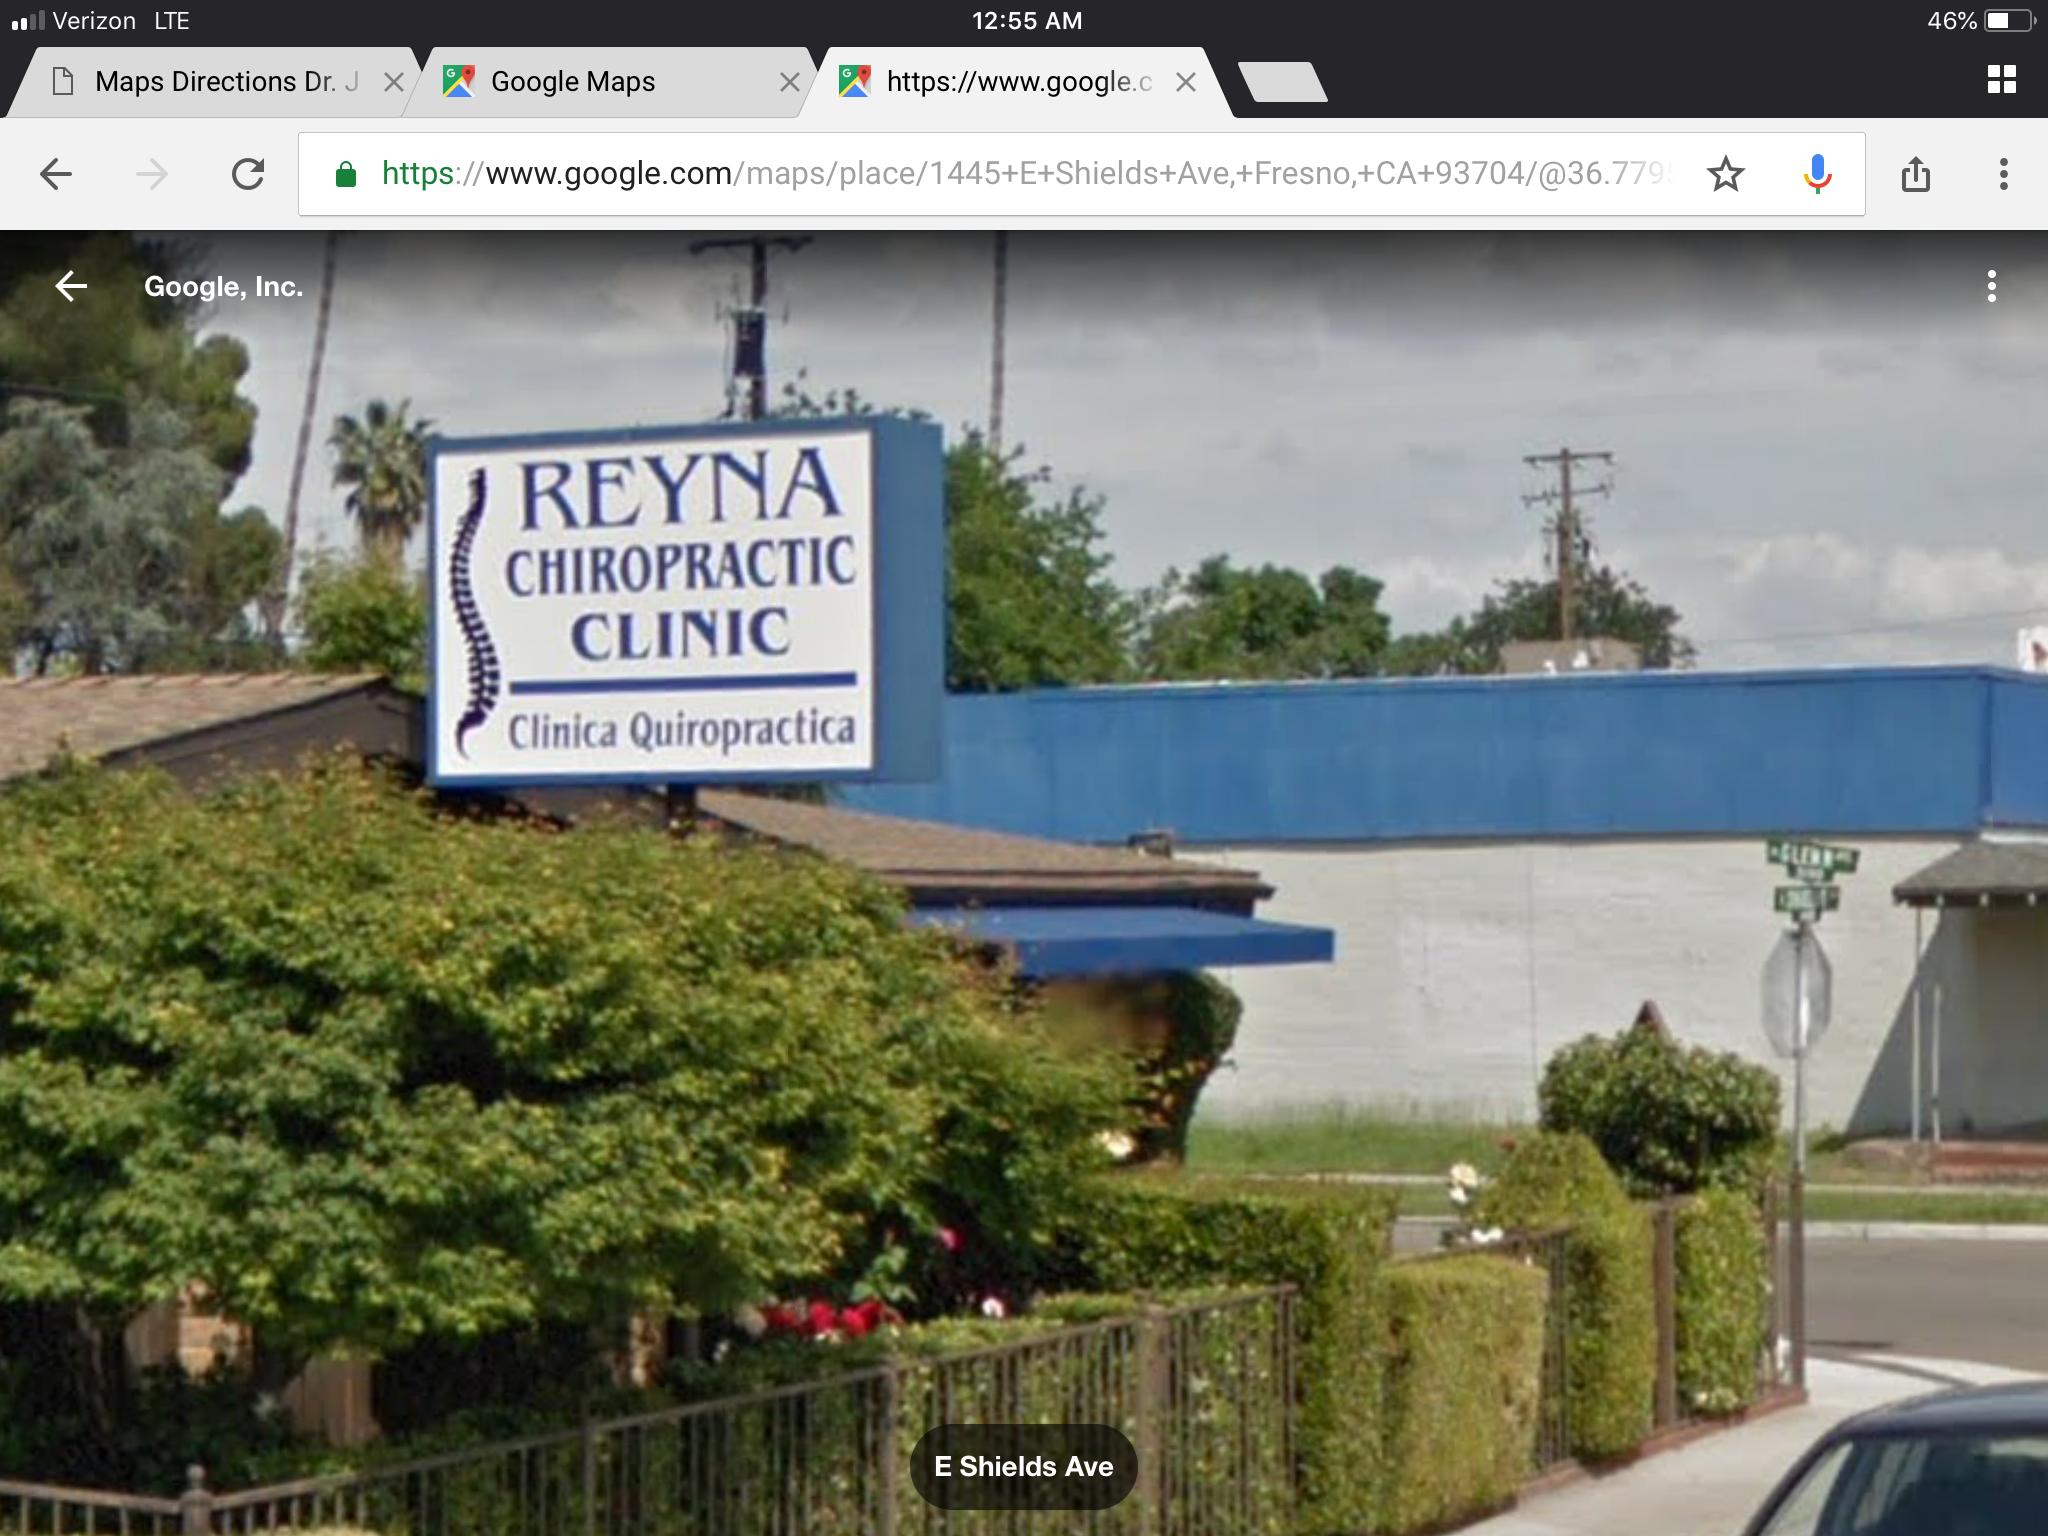 Reyna Chiropractic Clinic - Fresno, CA